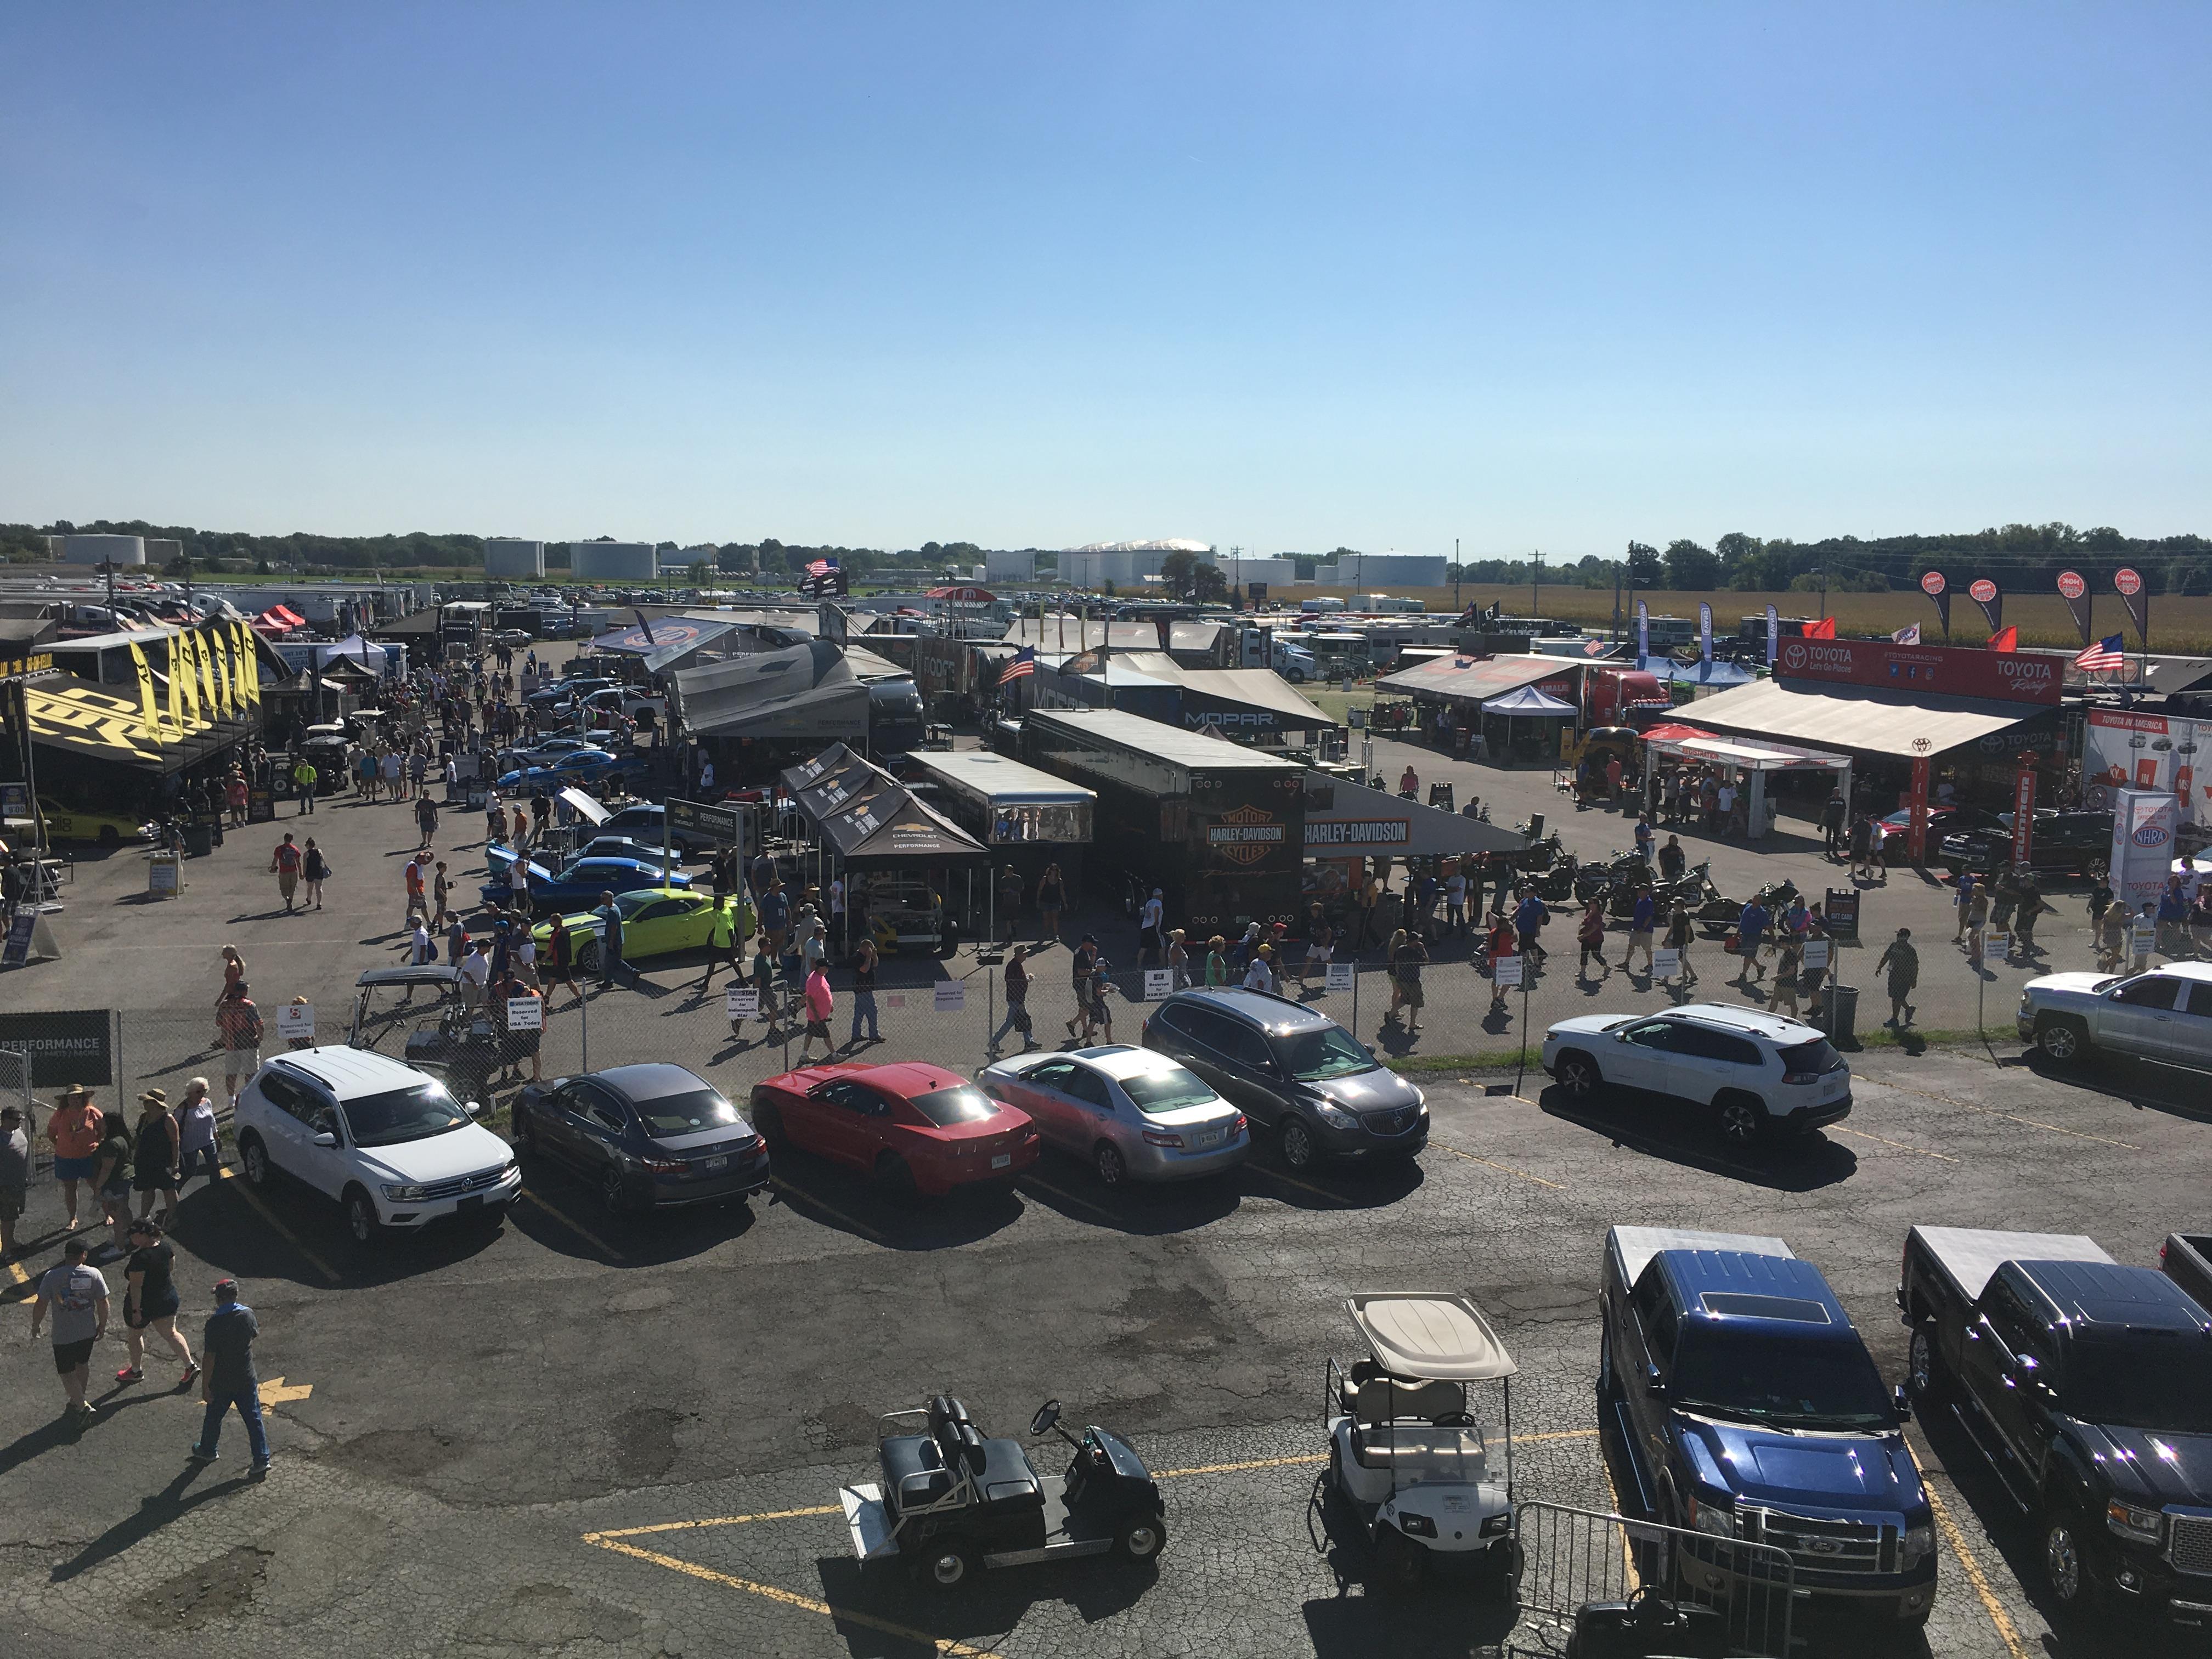 Lucas Oil Raceway NHRA US Nationals Pits